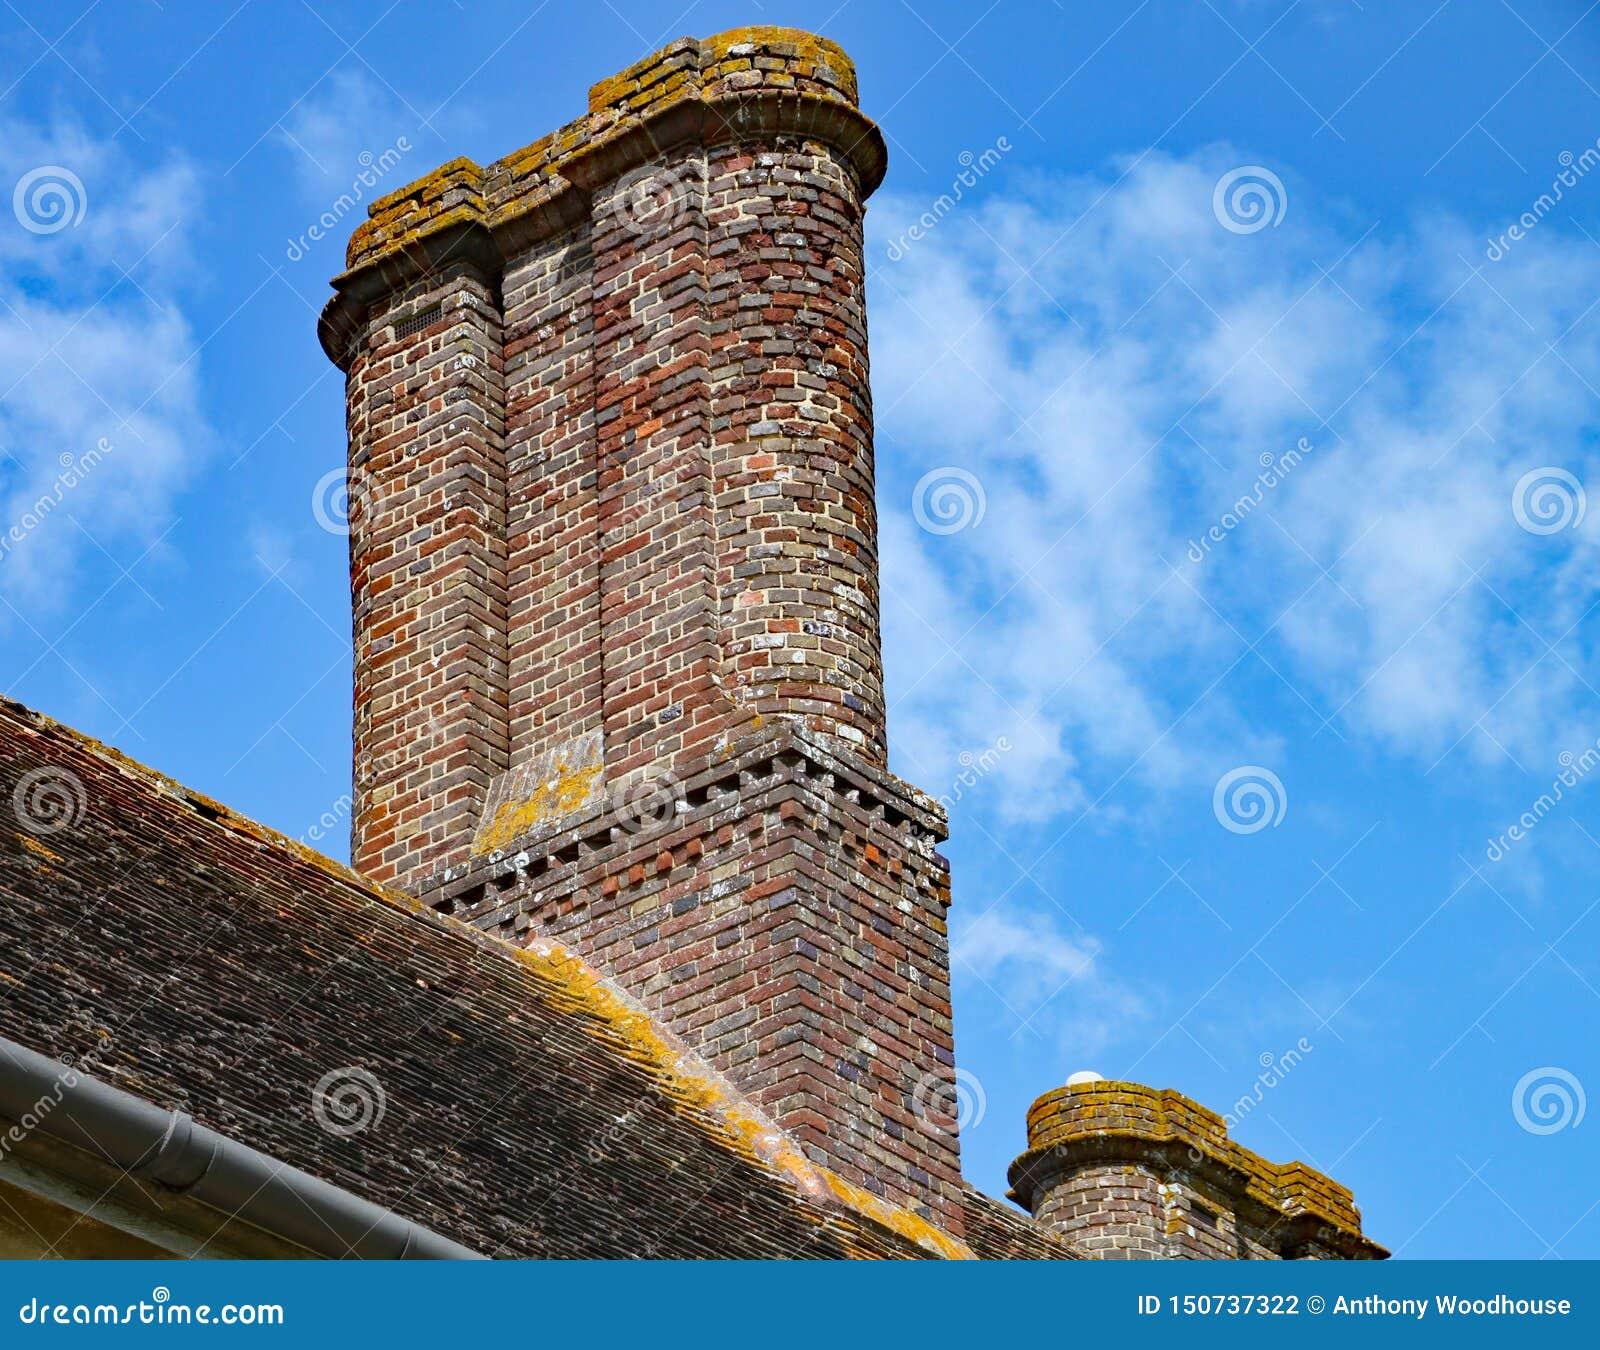 Una pila de chimenea vieja del ladrillo encima de una casa inglesa vieja